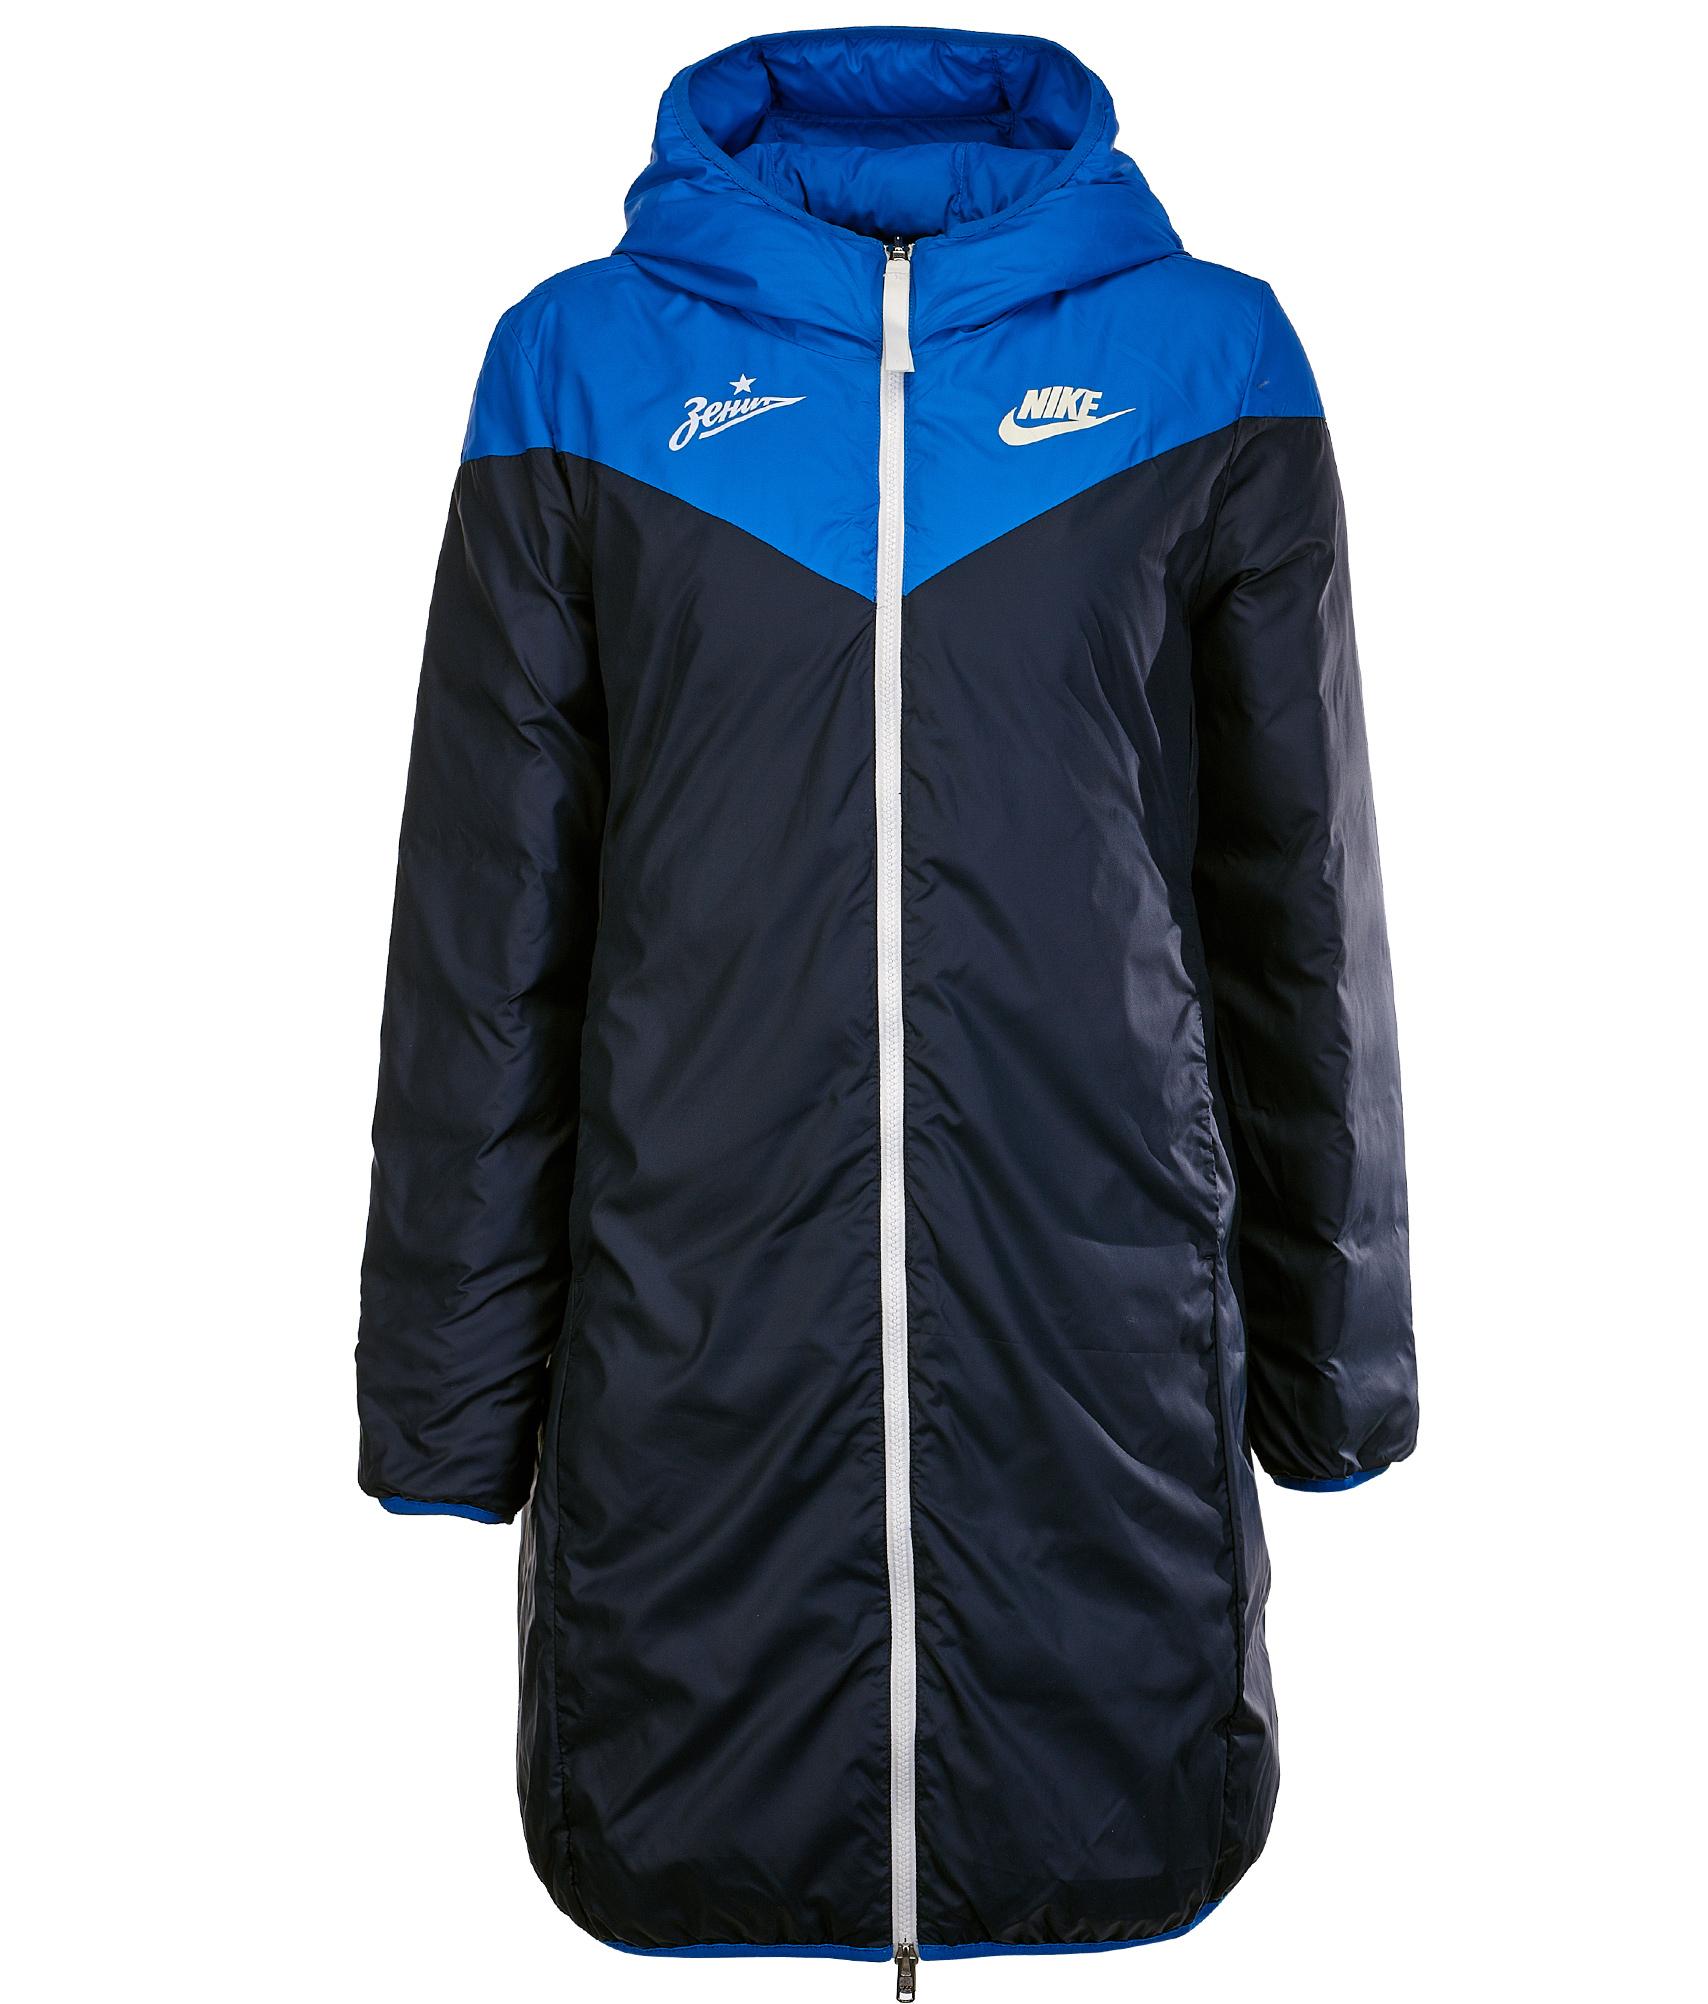 Парка двухсторонняя женская Nike Nike Цвет-Голубой свитшот мужской nike nike цвет голубой